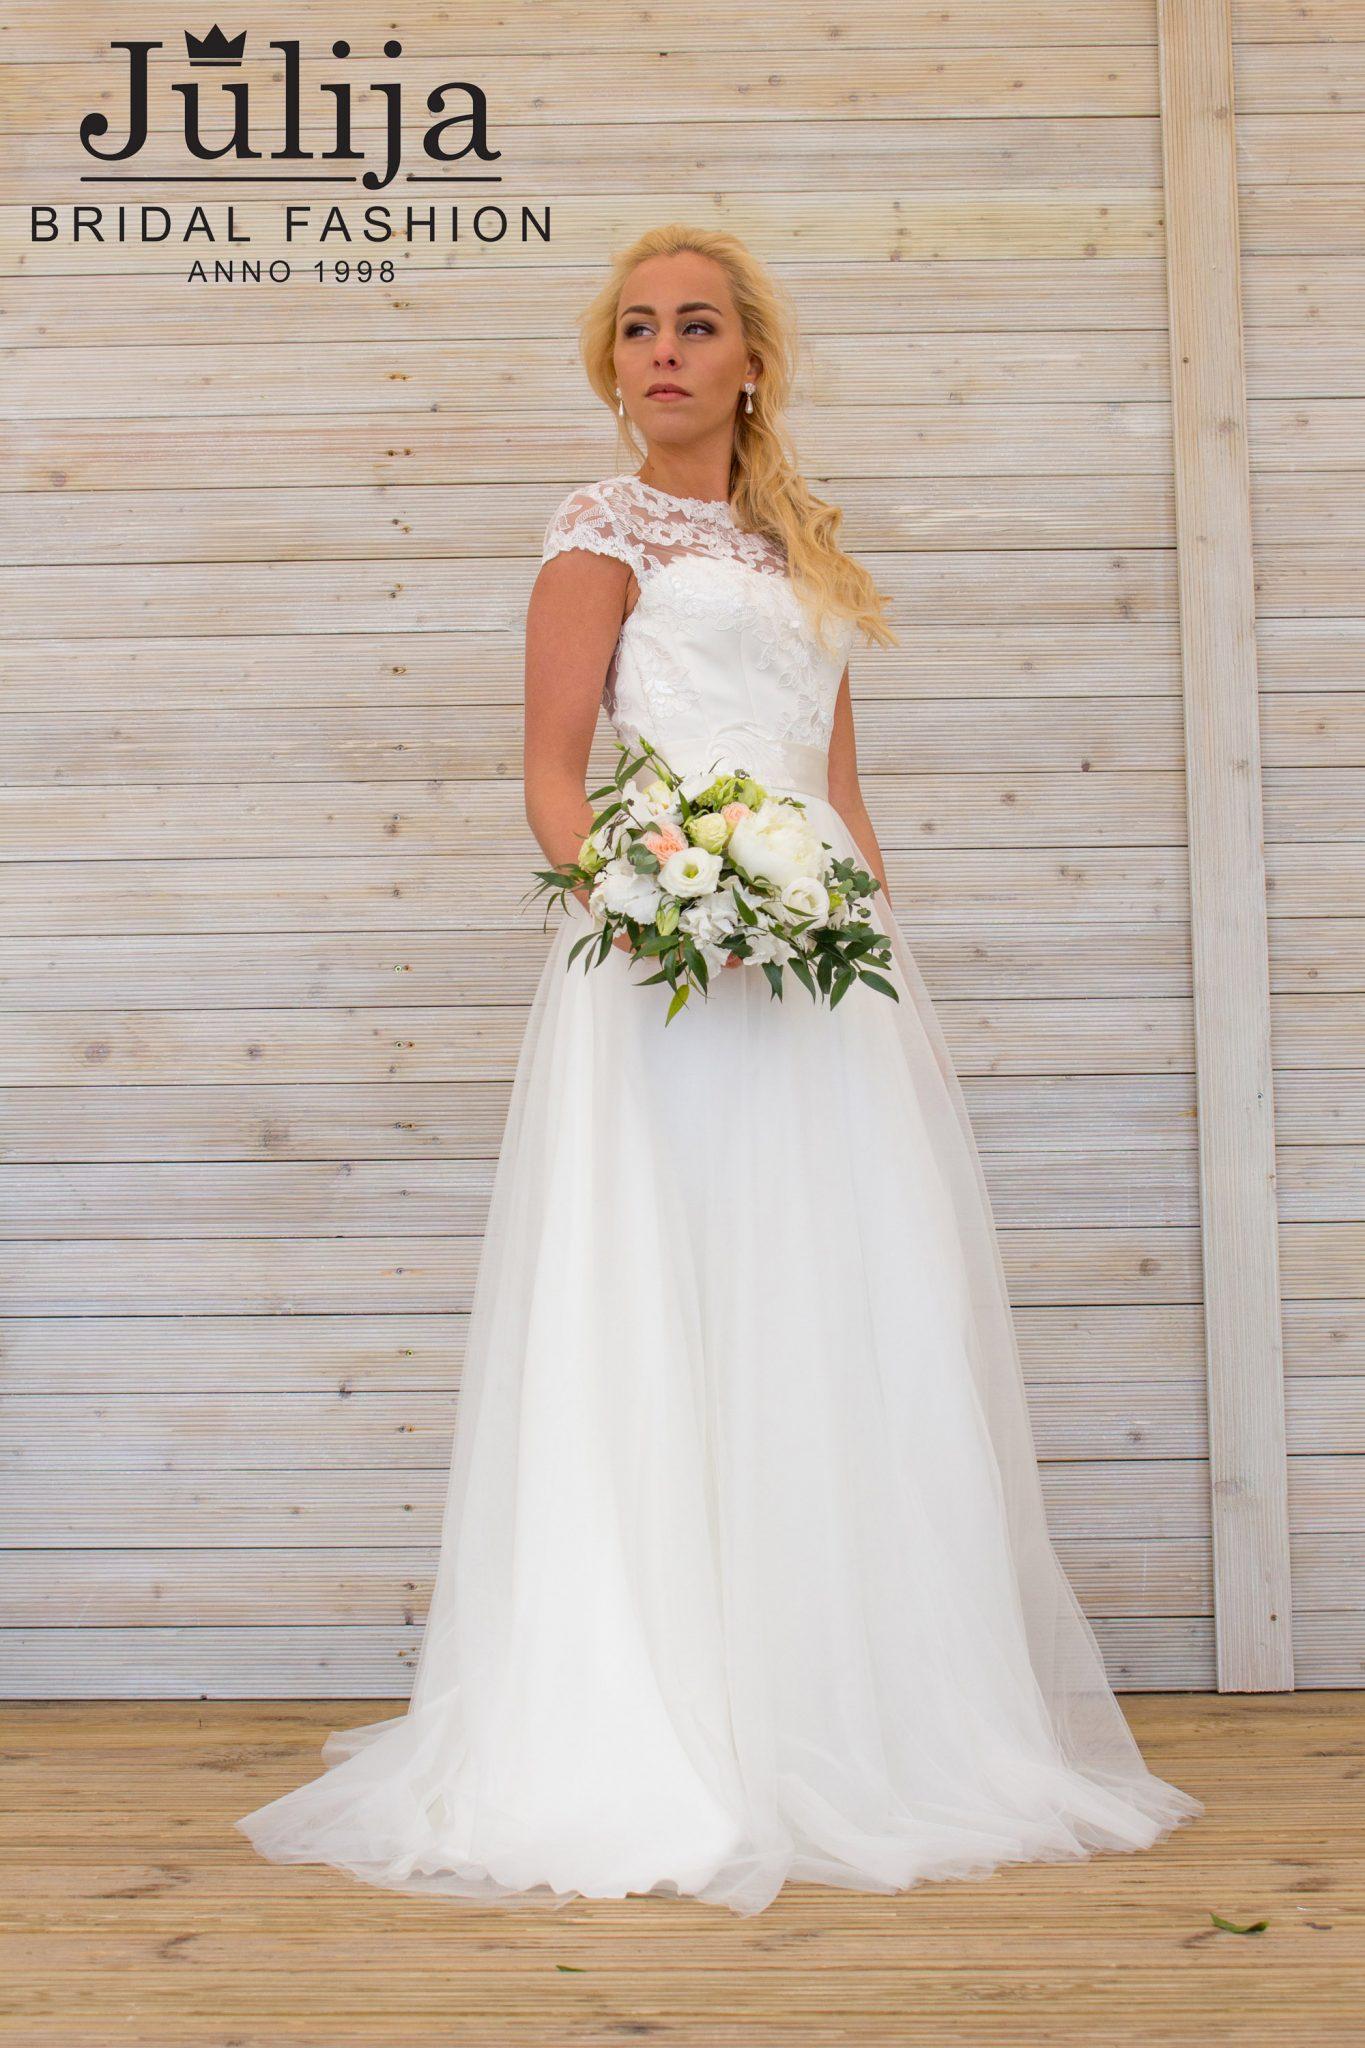 Allison | Wholesale wedding dresses - Julija Bridal Fashion